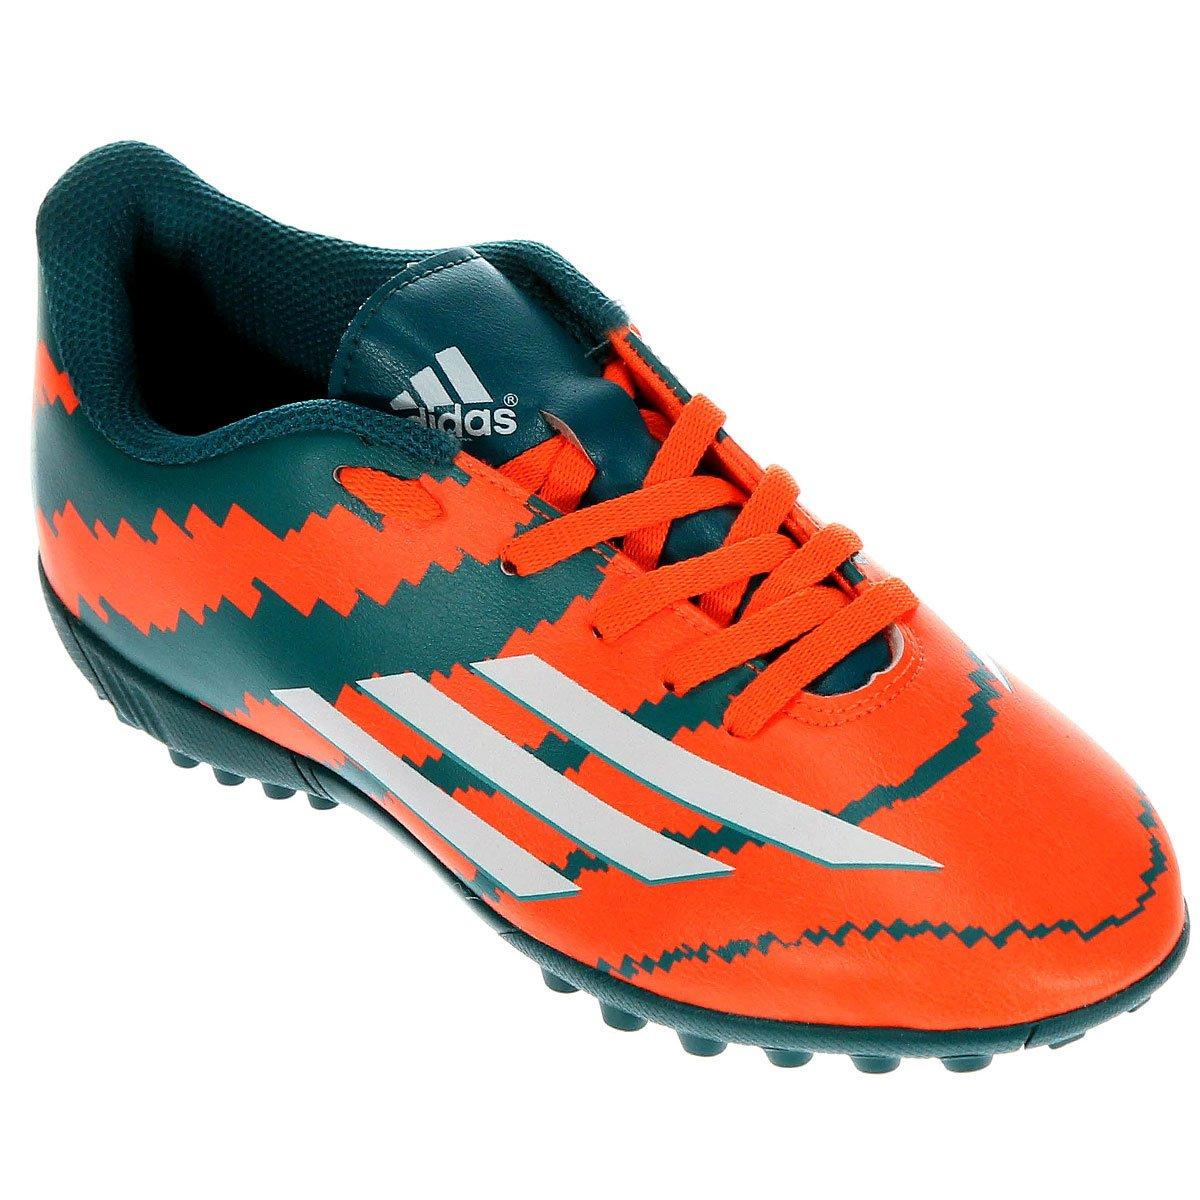 a0bb6f97f8 Chuteira Adidas F5 TF Society Messi Infantil - Compre Agora